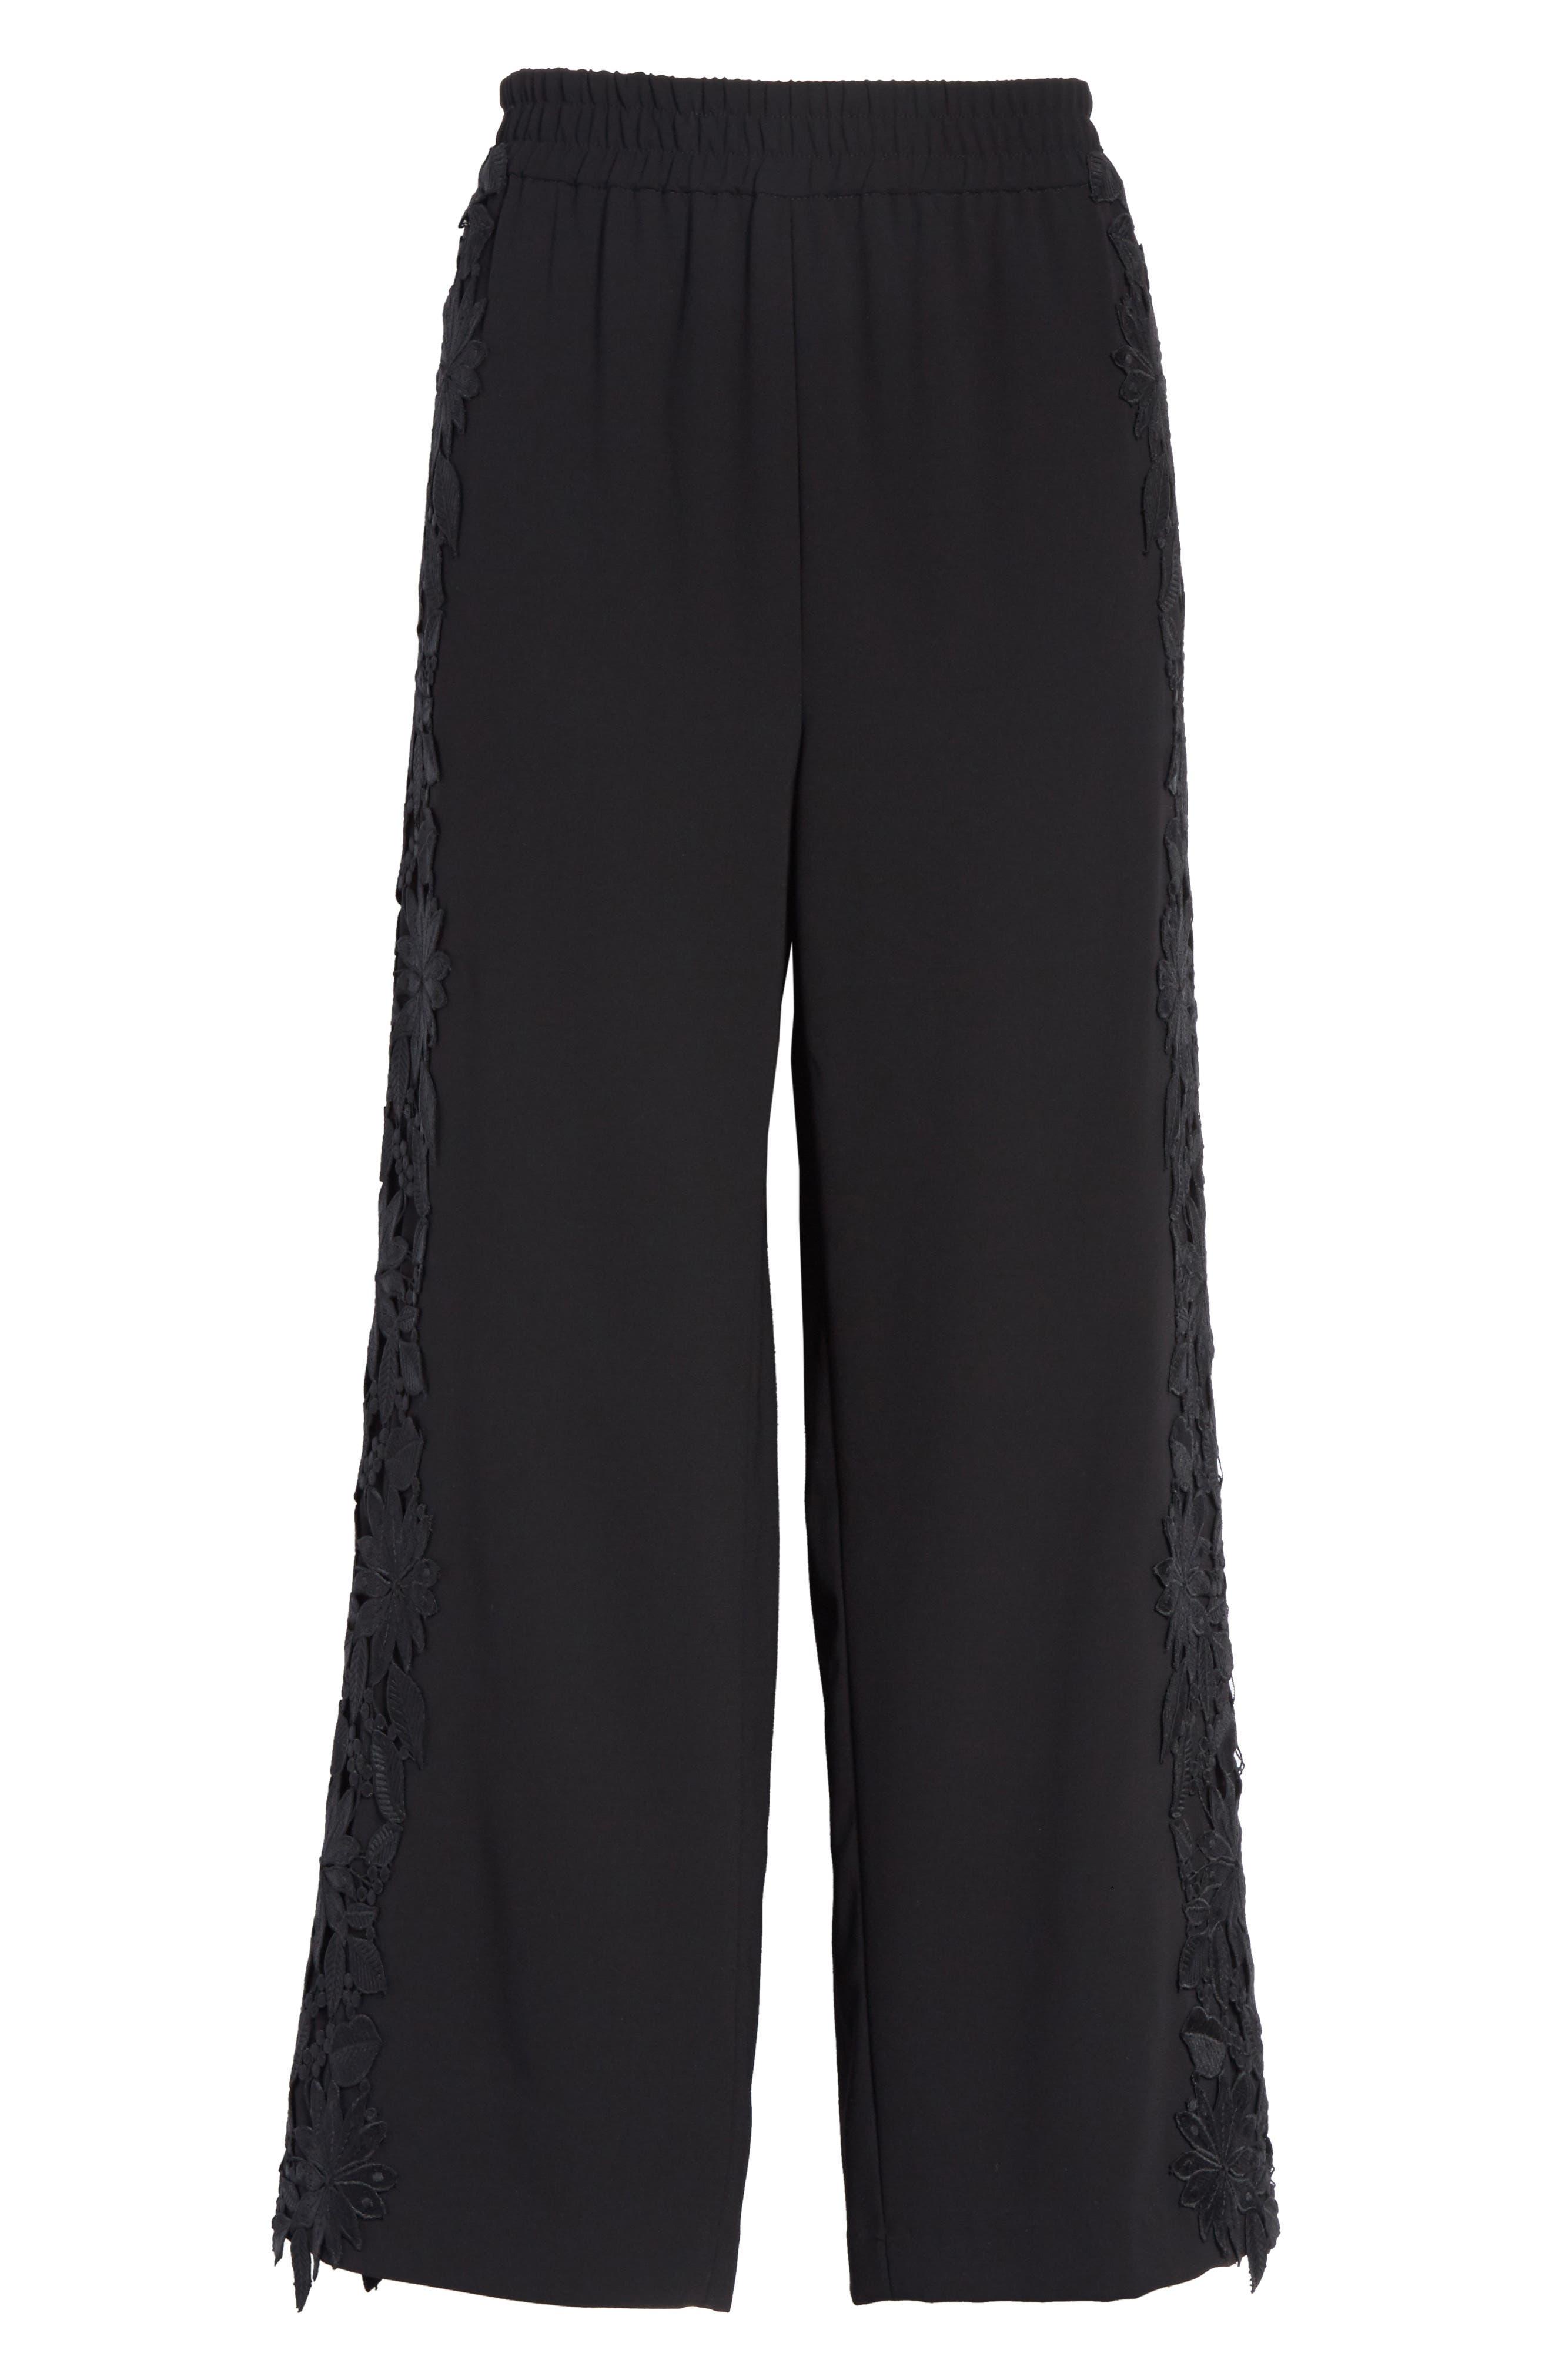 Benny Side Lace Crop Pants,                             Alternate thumbnail 7, color,                             001